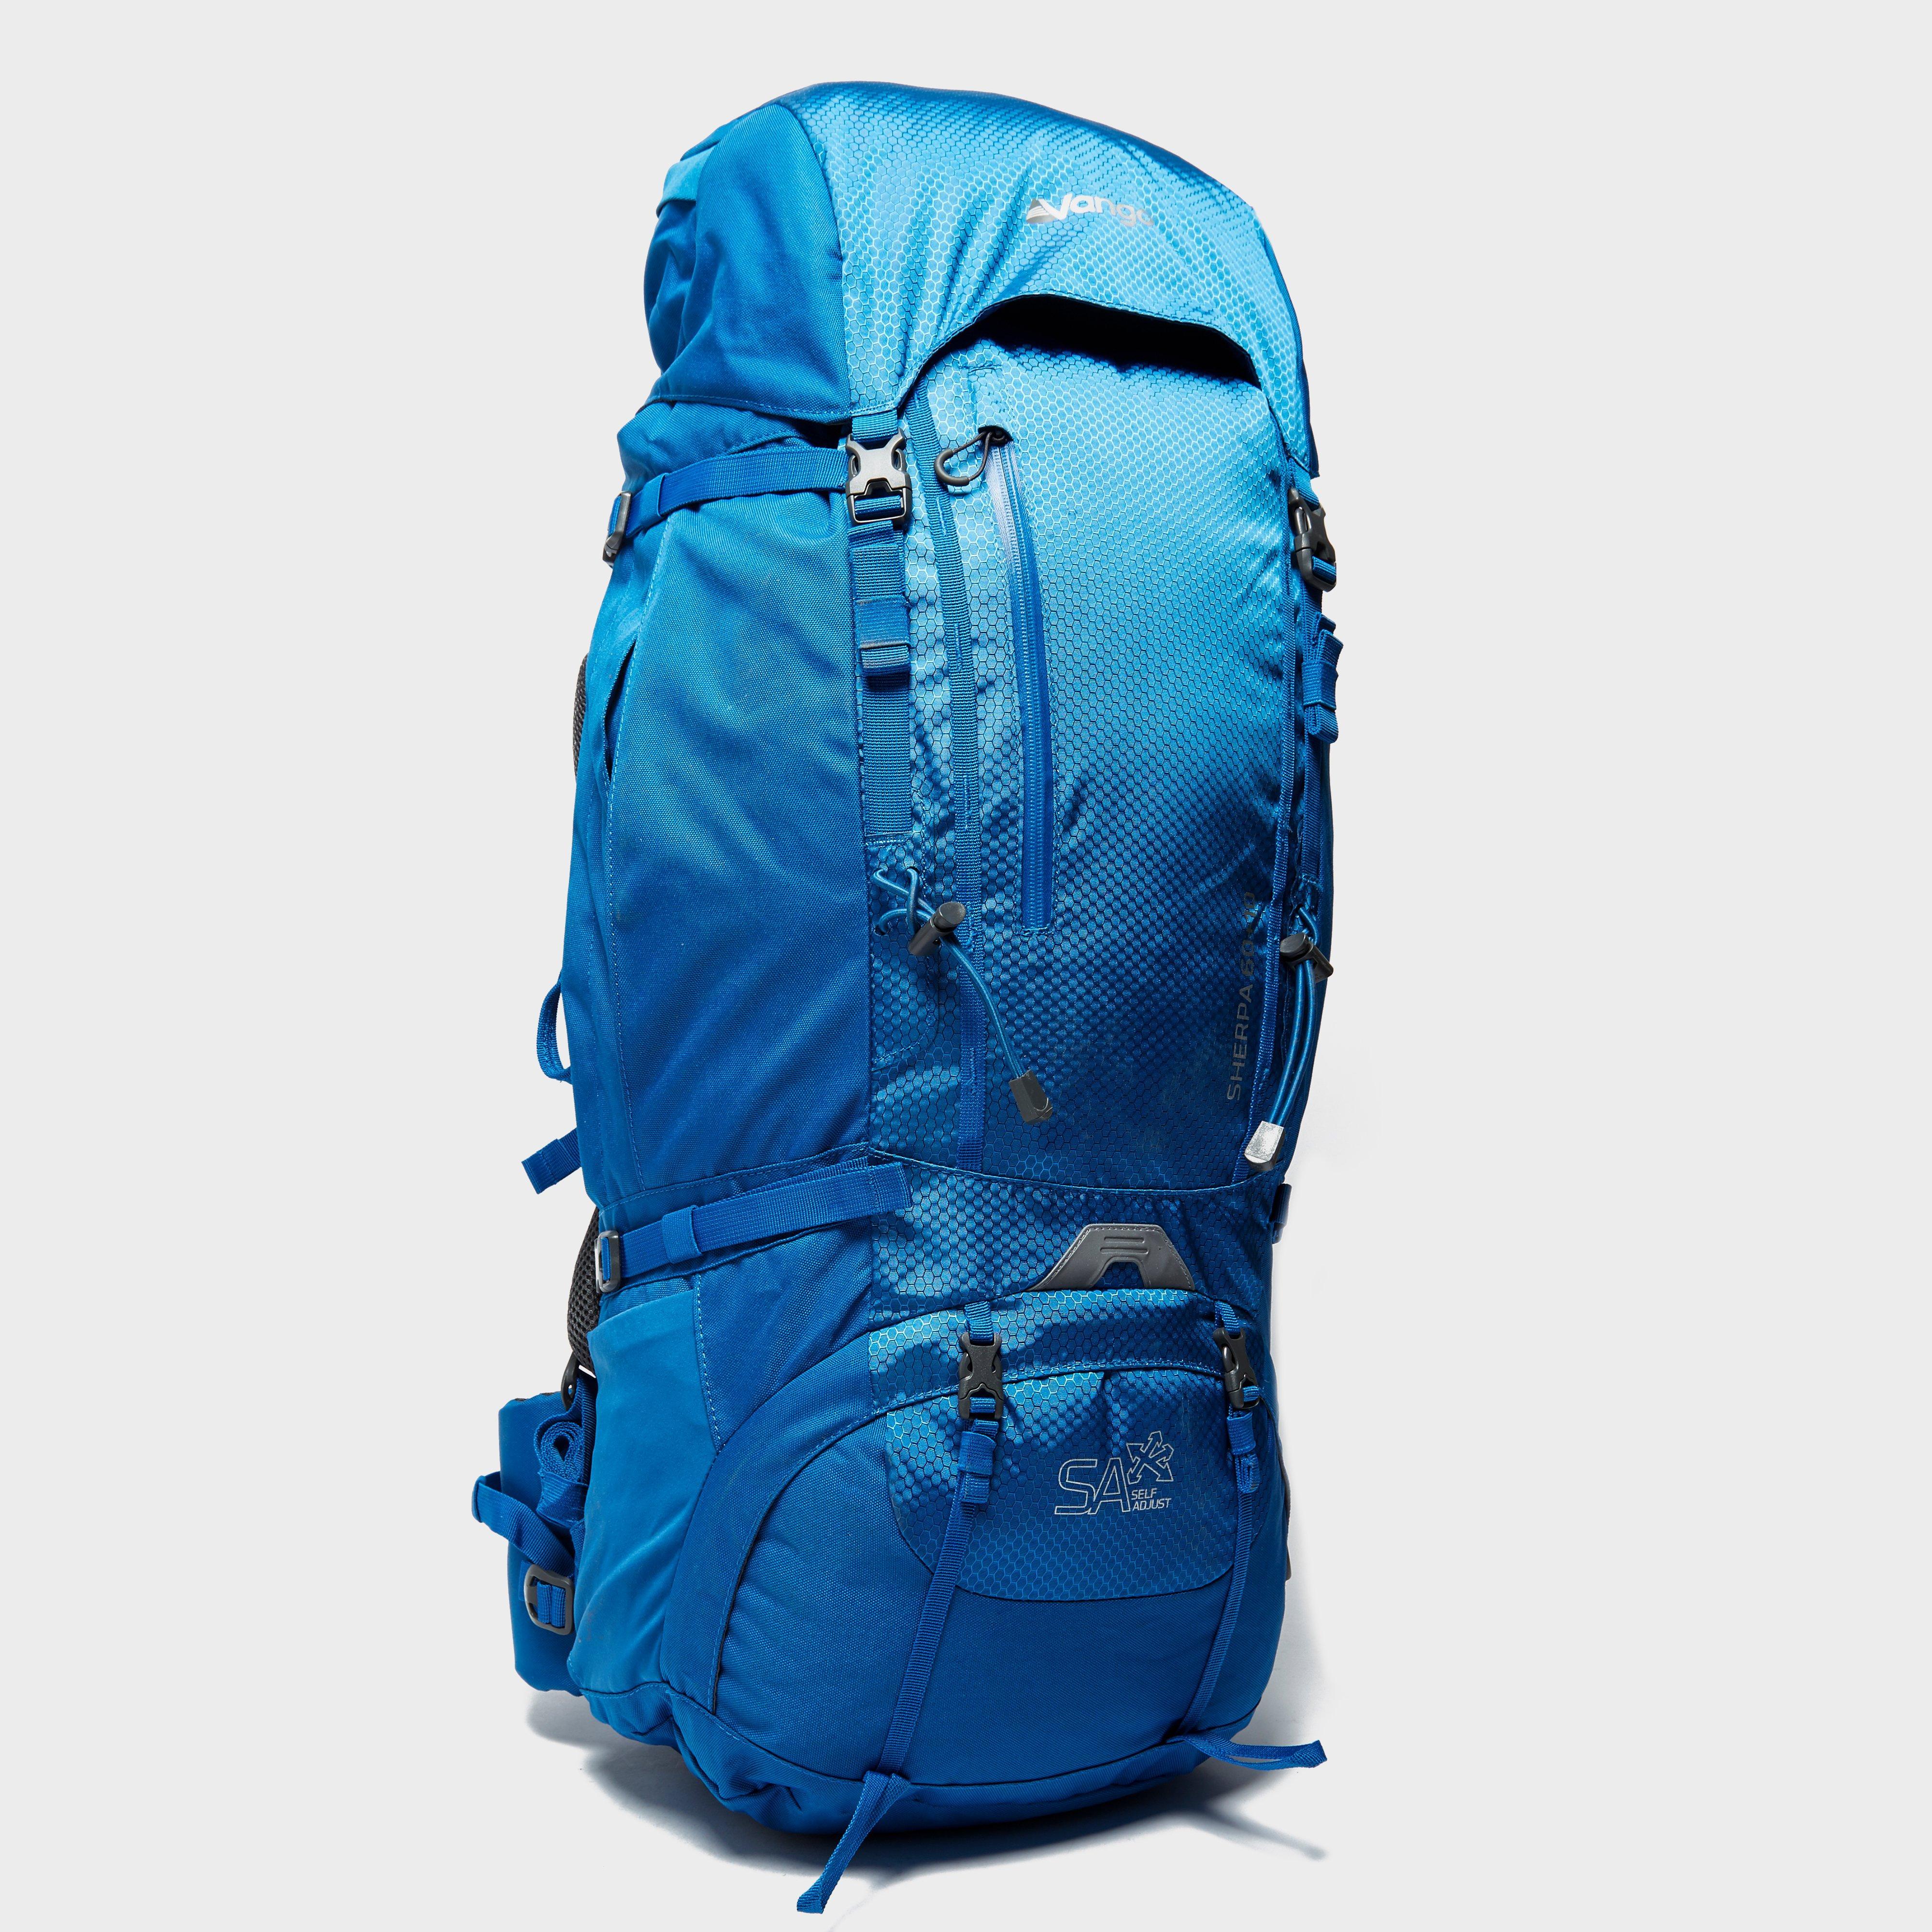 49882a0b2cb7 Blue Vango Sherpa 60+10 Rucksack